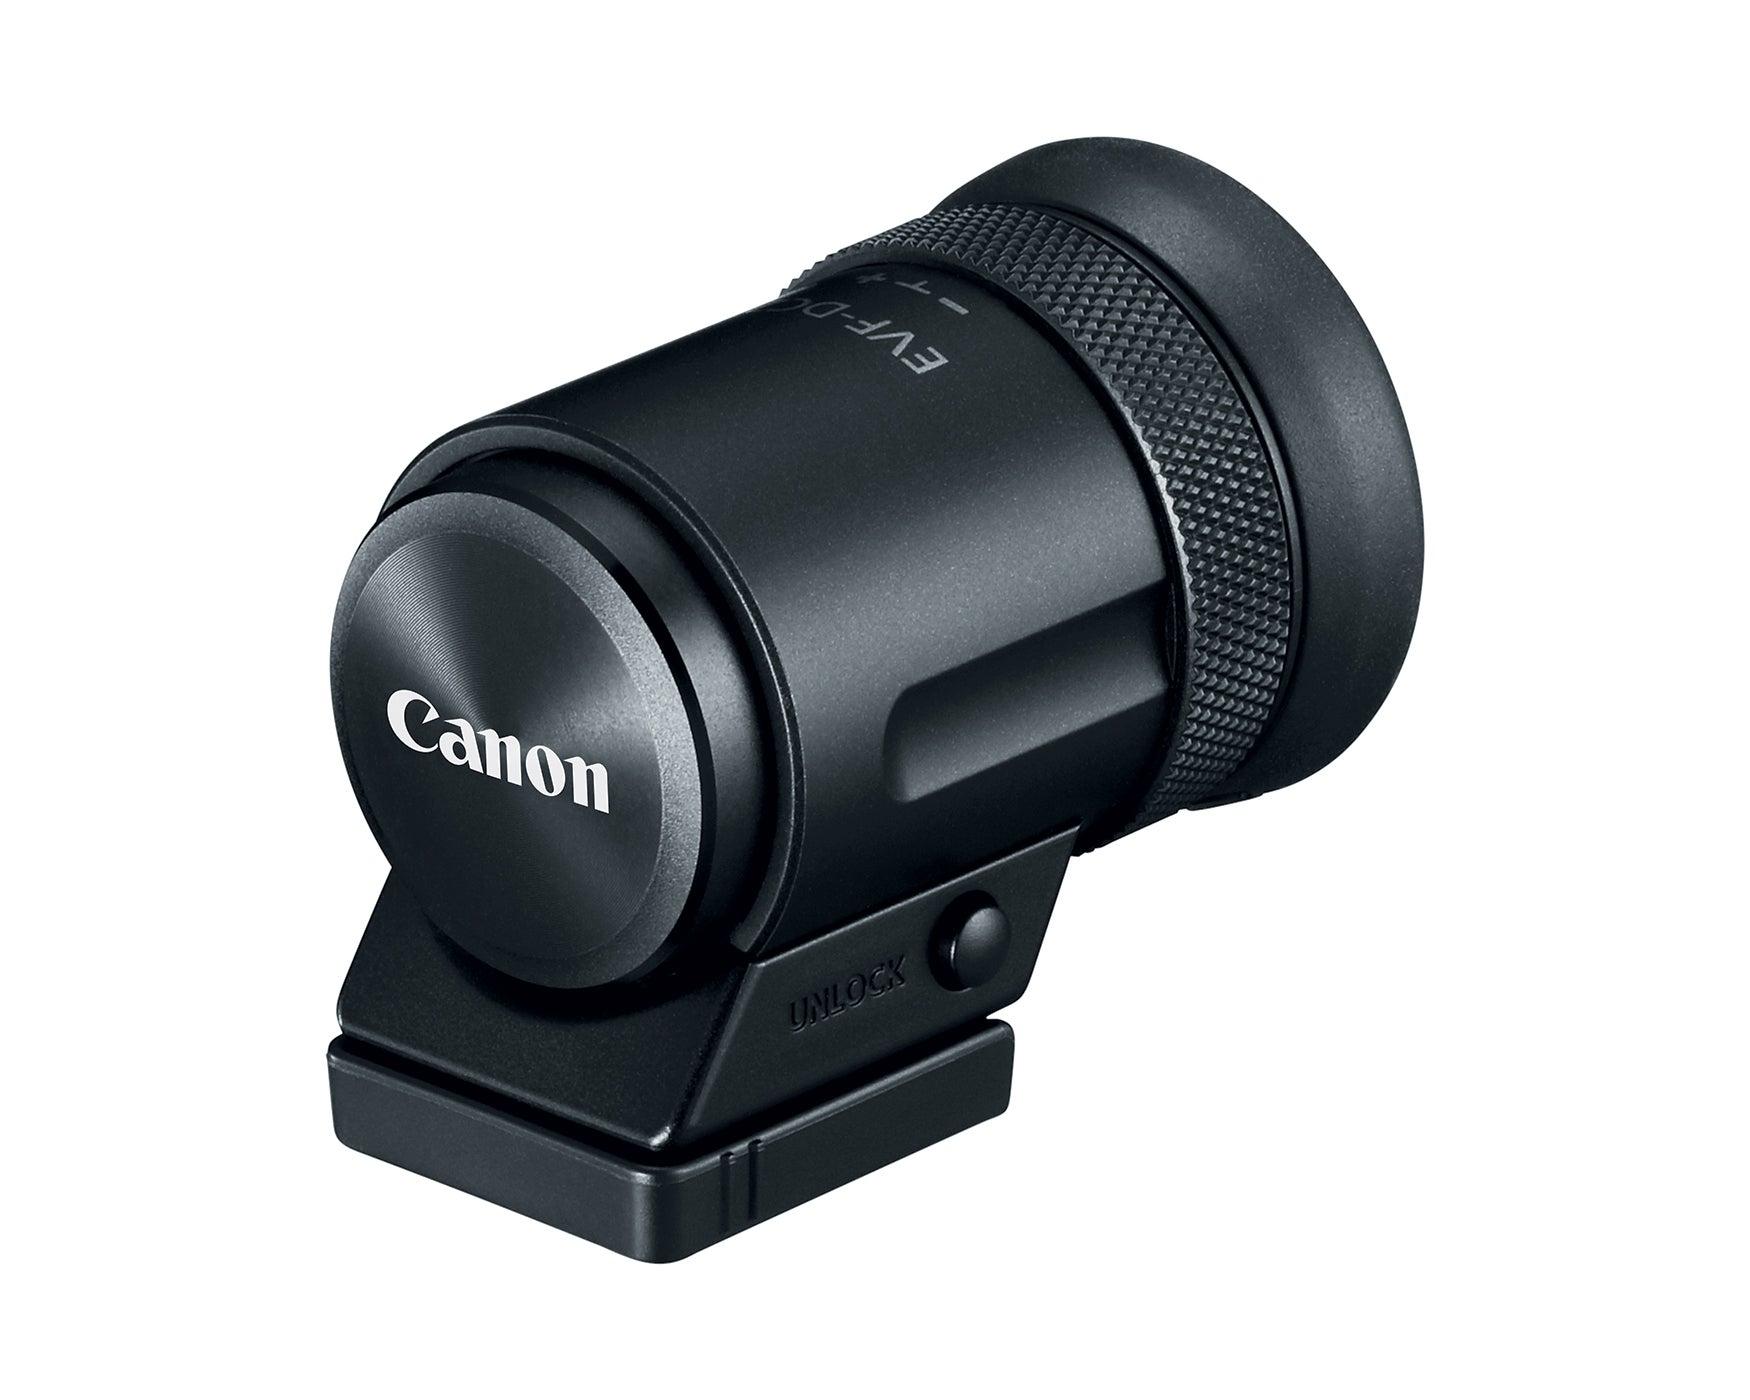 Canon EOS M6 Mirrorless Camera Viewfinder